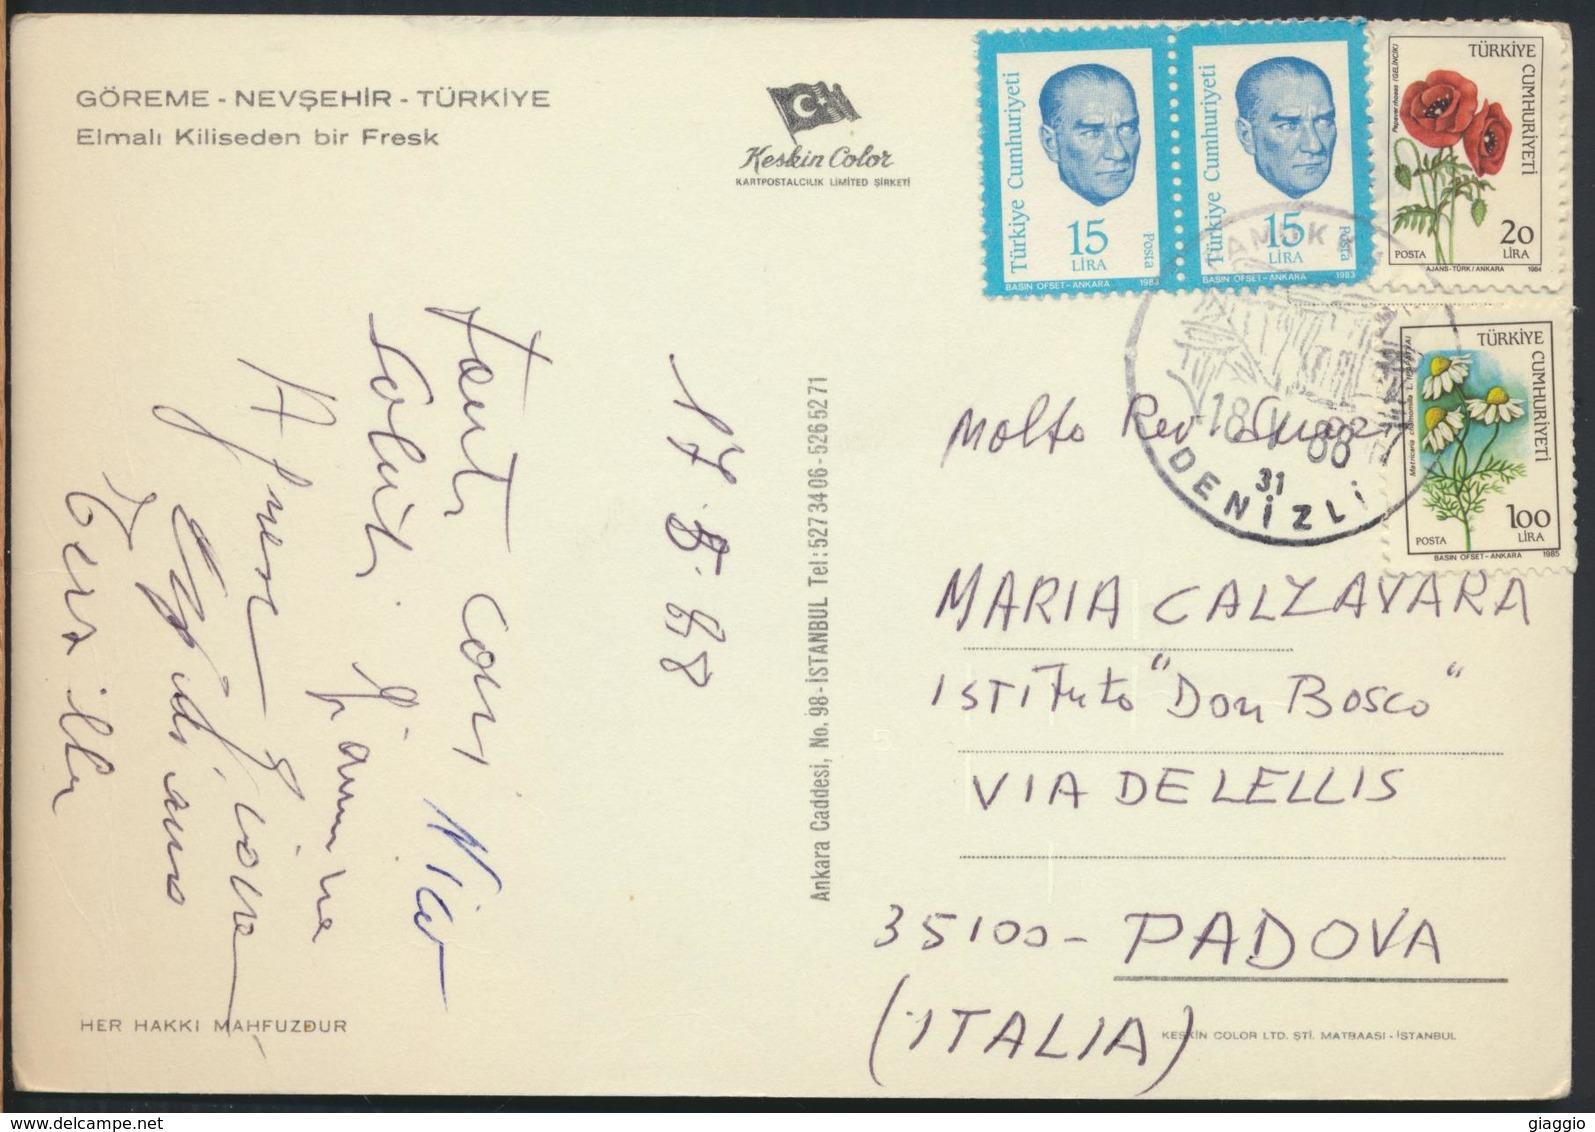 °°° 13049 - TURKEY - GOREME NEVSEHIR - ELMALI KILISEDEN BIR FRESK - 1988 With Stamps °°° - Turchia